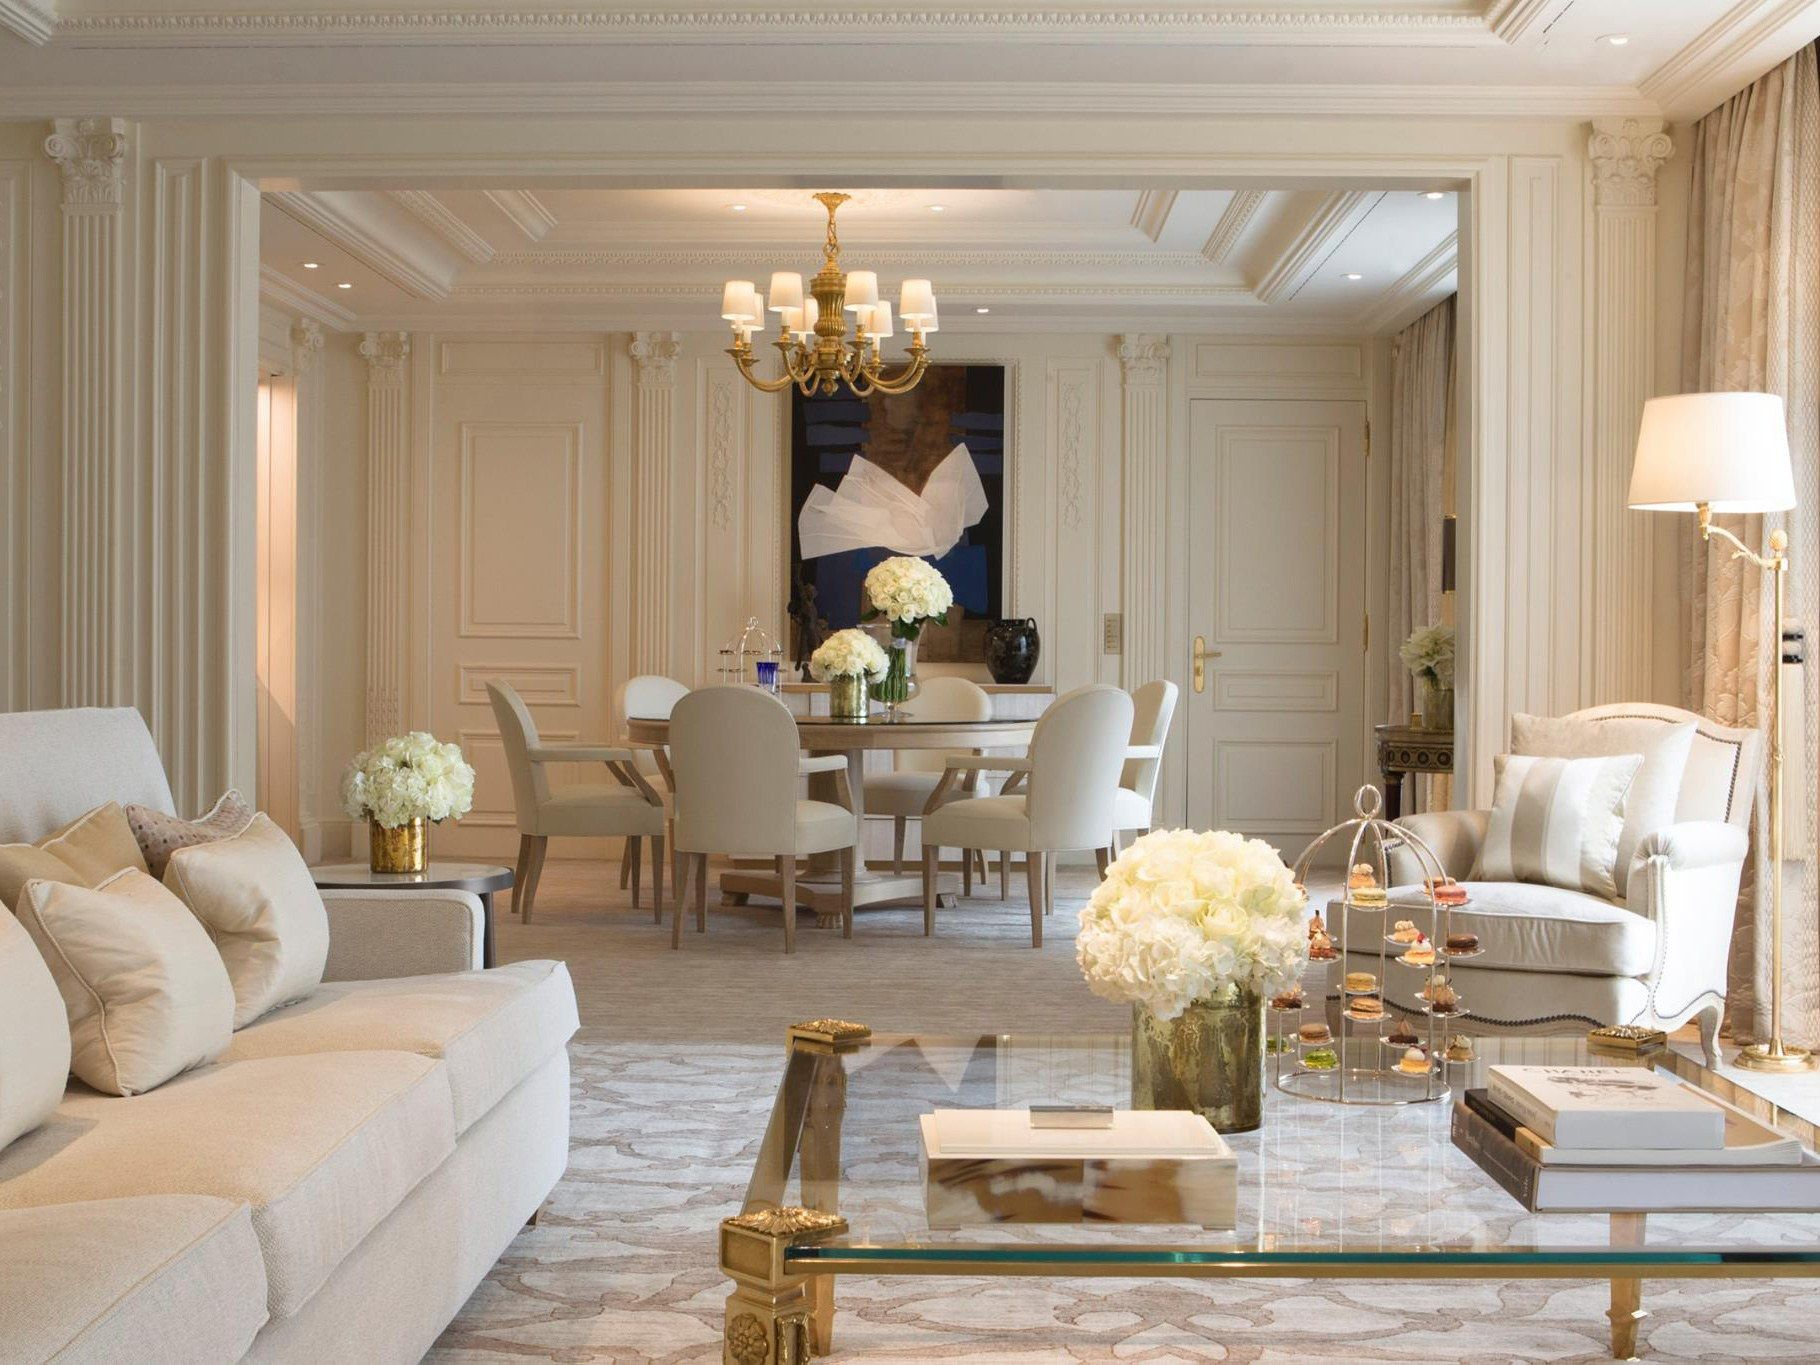 ideas about Four Seasons Hotel on Pinterest Romantic